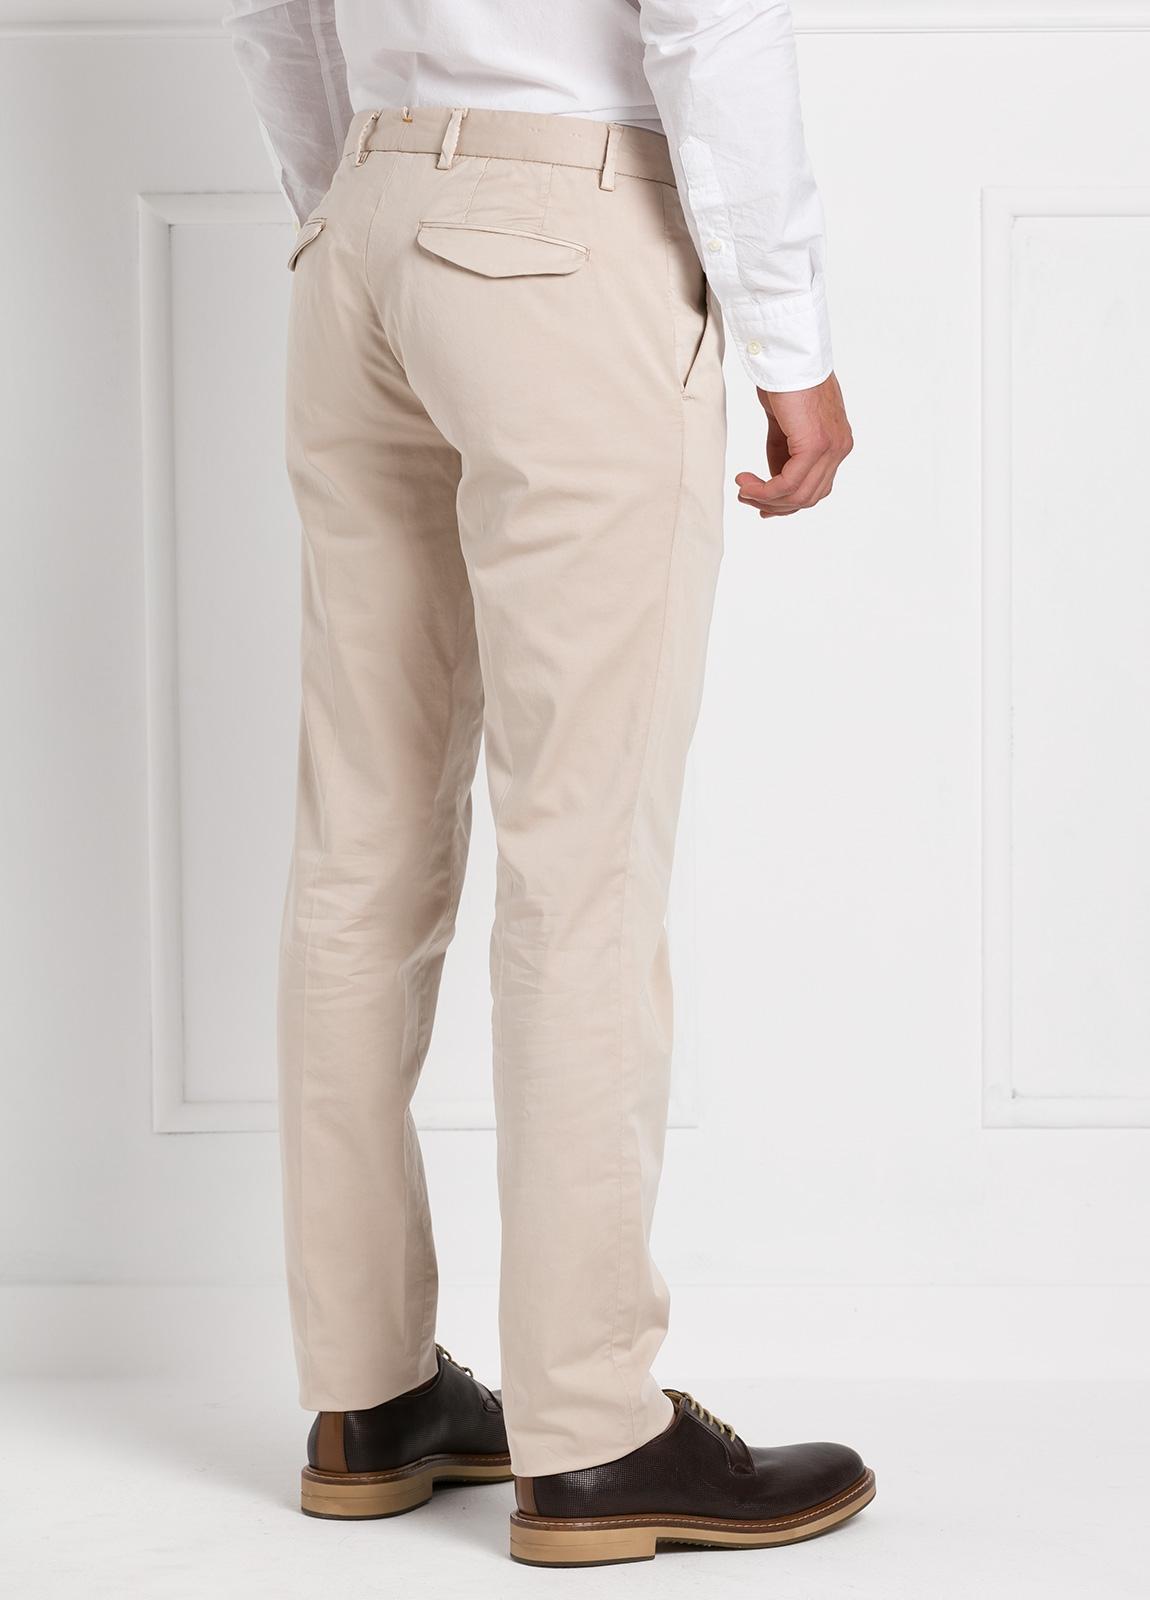 Pantalón modelo slim fit 1 pinza color beige. 97% Algodón 3% Ea. - Ítem2